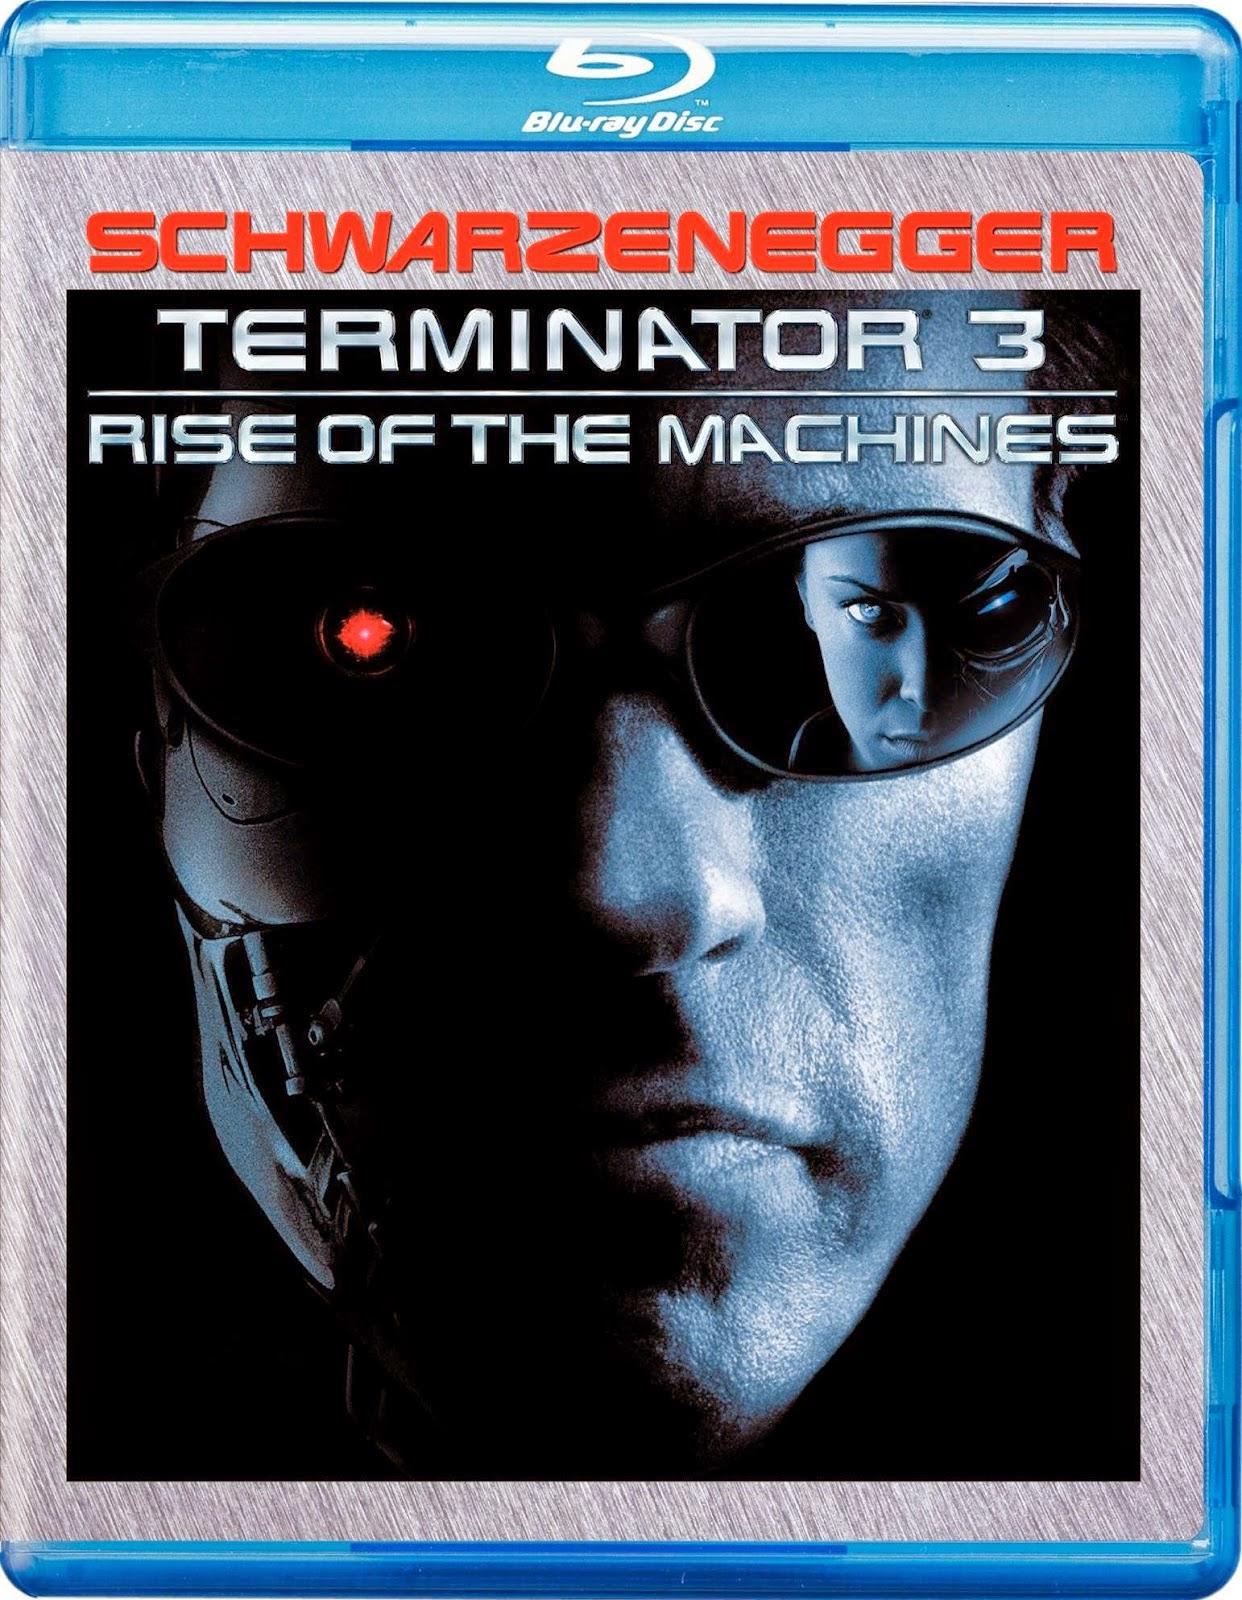 Terminator 3: Rise of the Machines ( 2003 )  คนเหล็ก 3 กำเนิดใหม่เครื่องจักรสังหาร